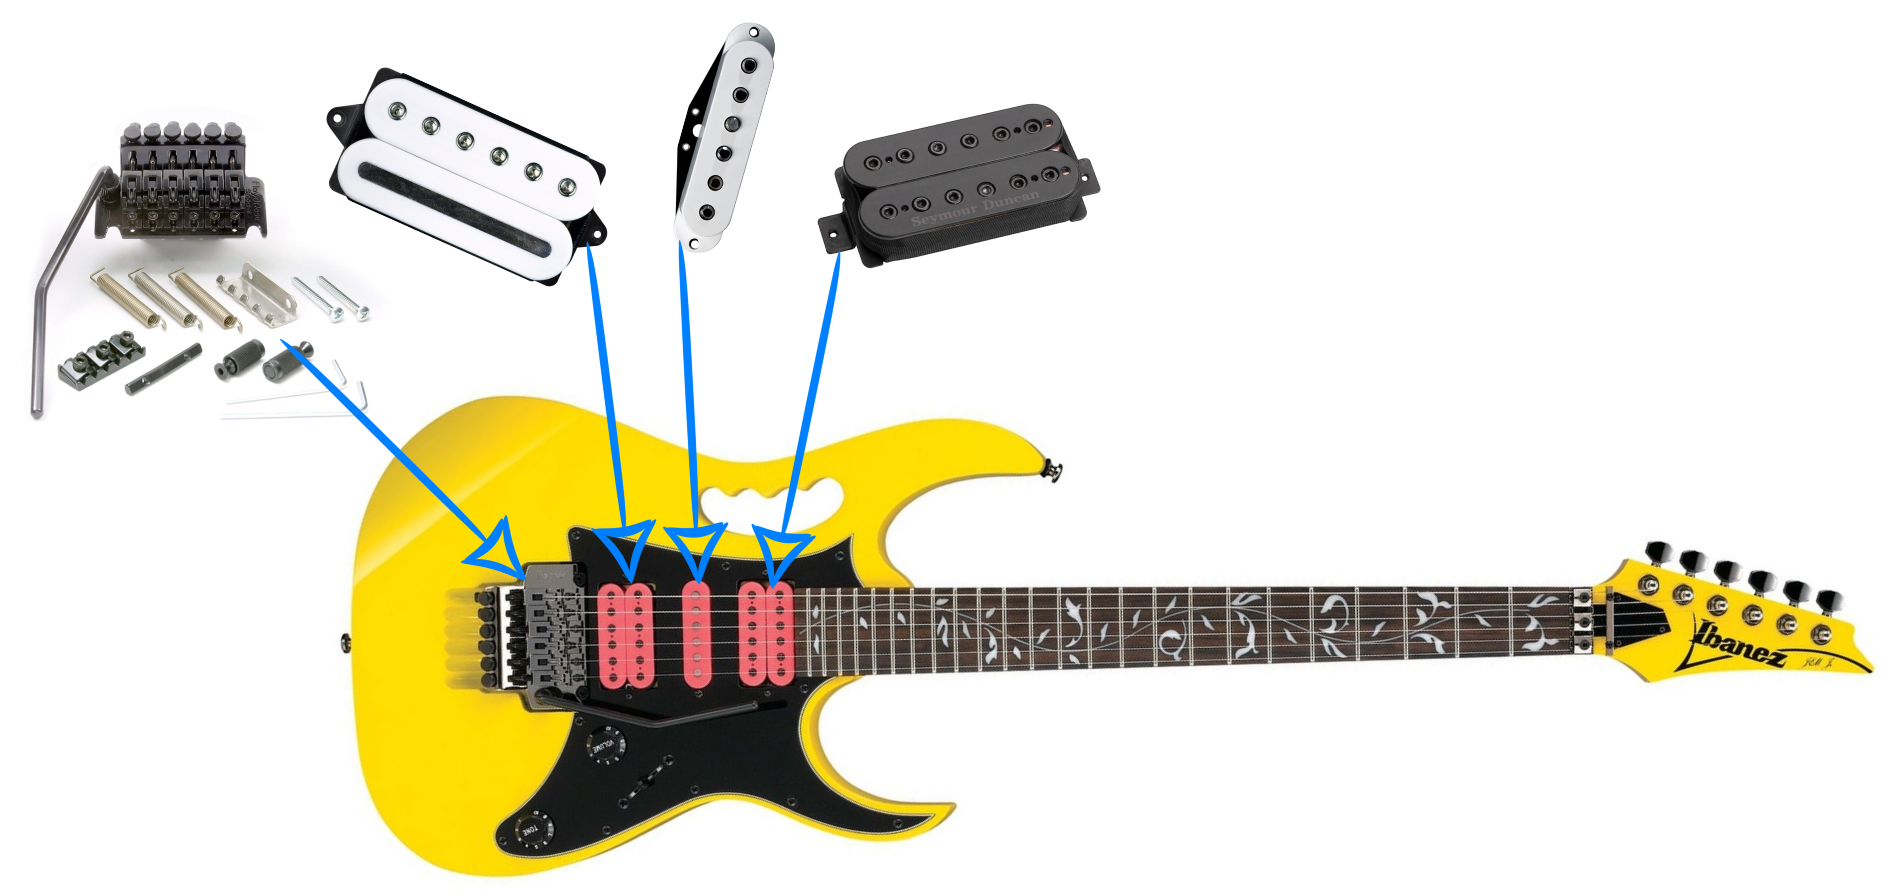 Ibanez JEM JR Pickup Upgrade Suggestion (Steve Vai Signature ... on